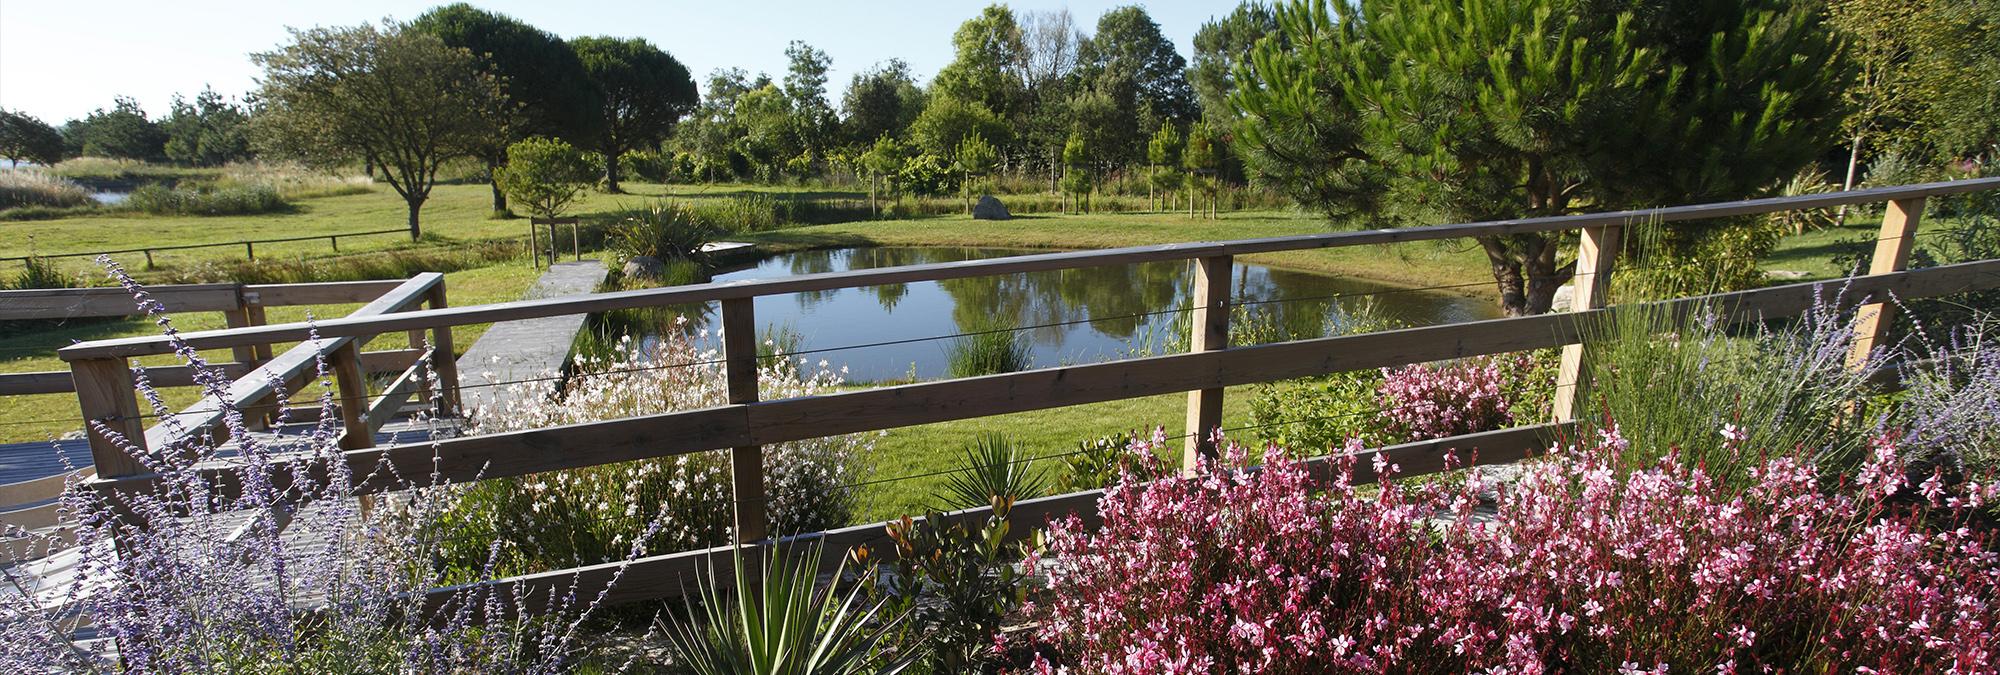 Paysagiste en vend e id jardin olonne sur mer for Entretien jardin vendee